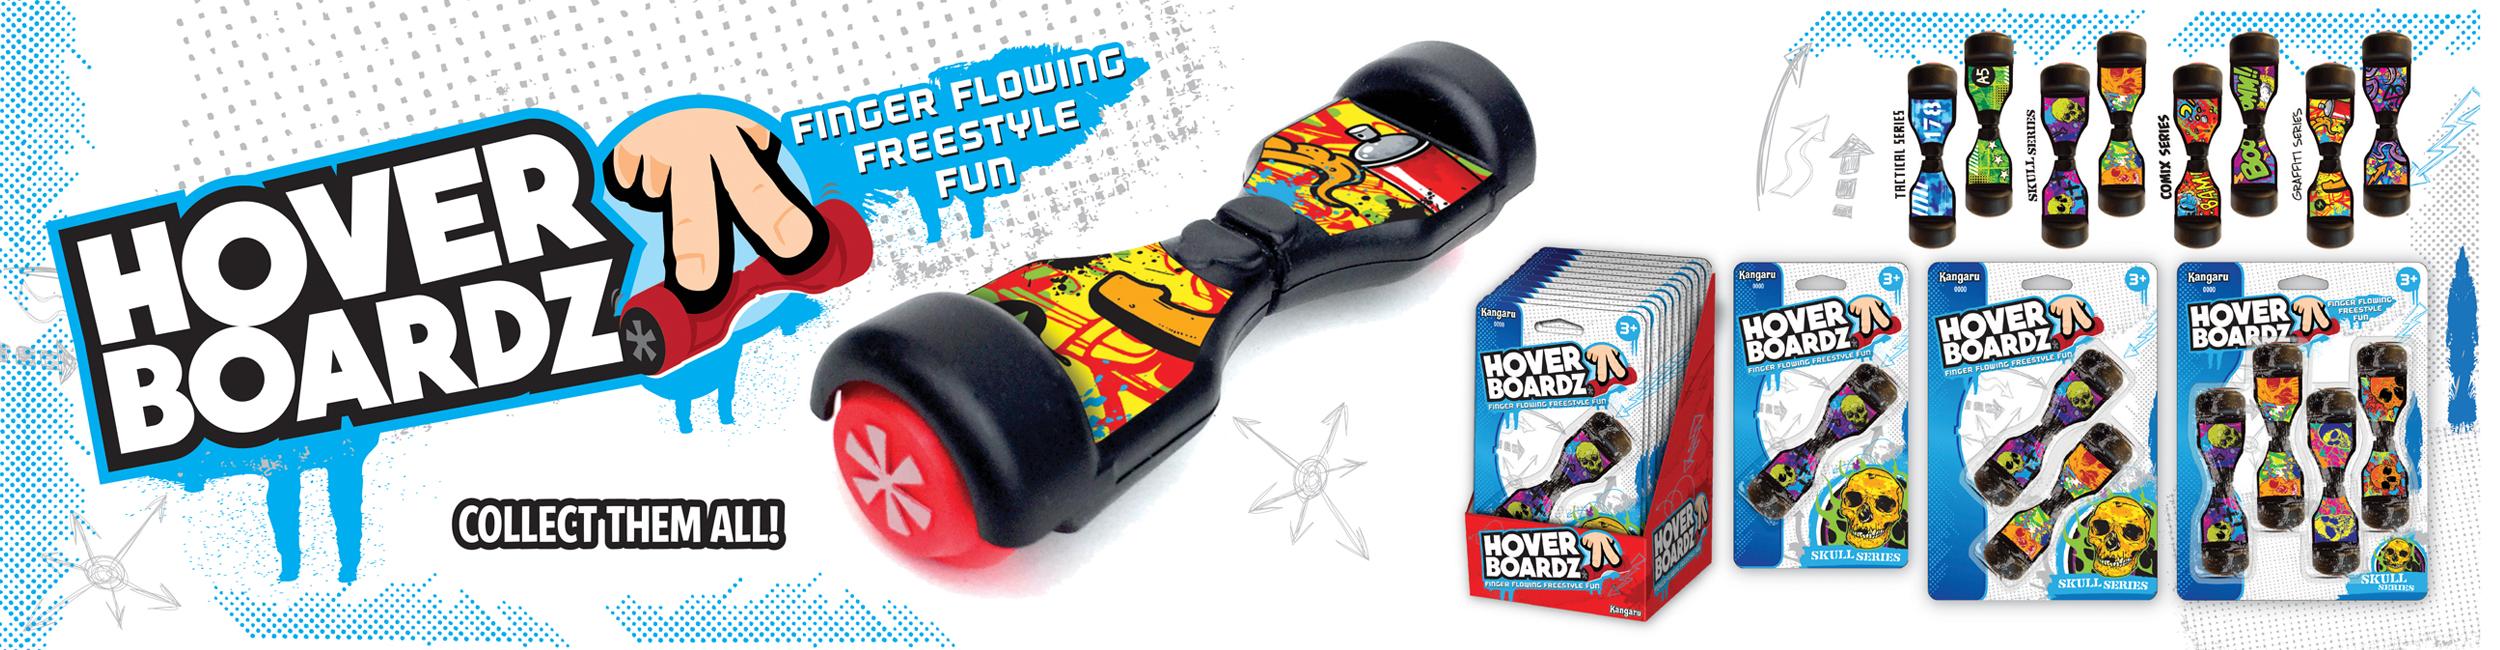 Hoverboardz.jpg